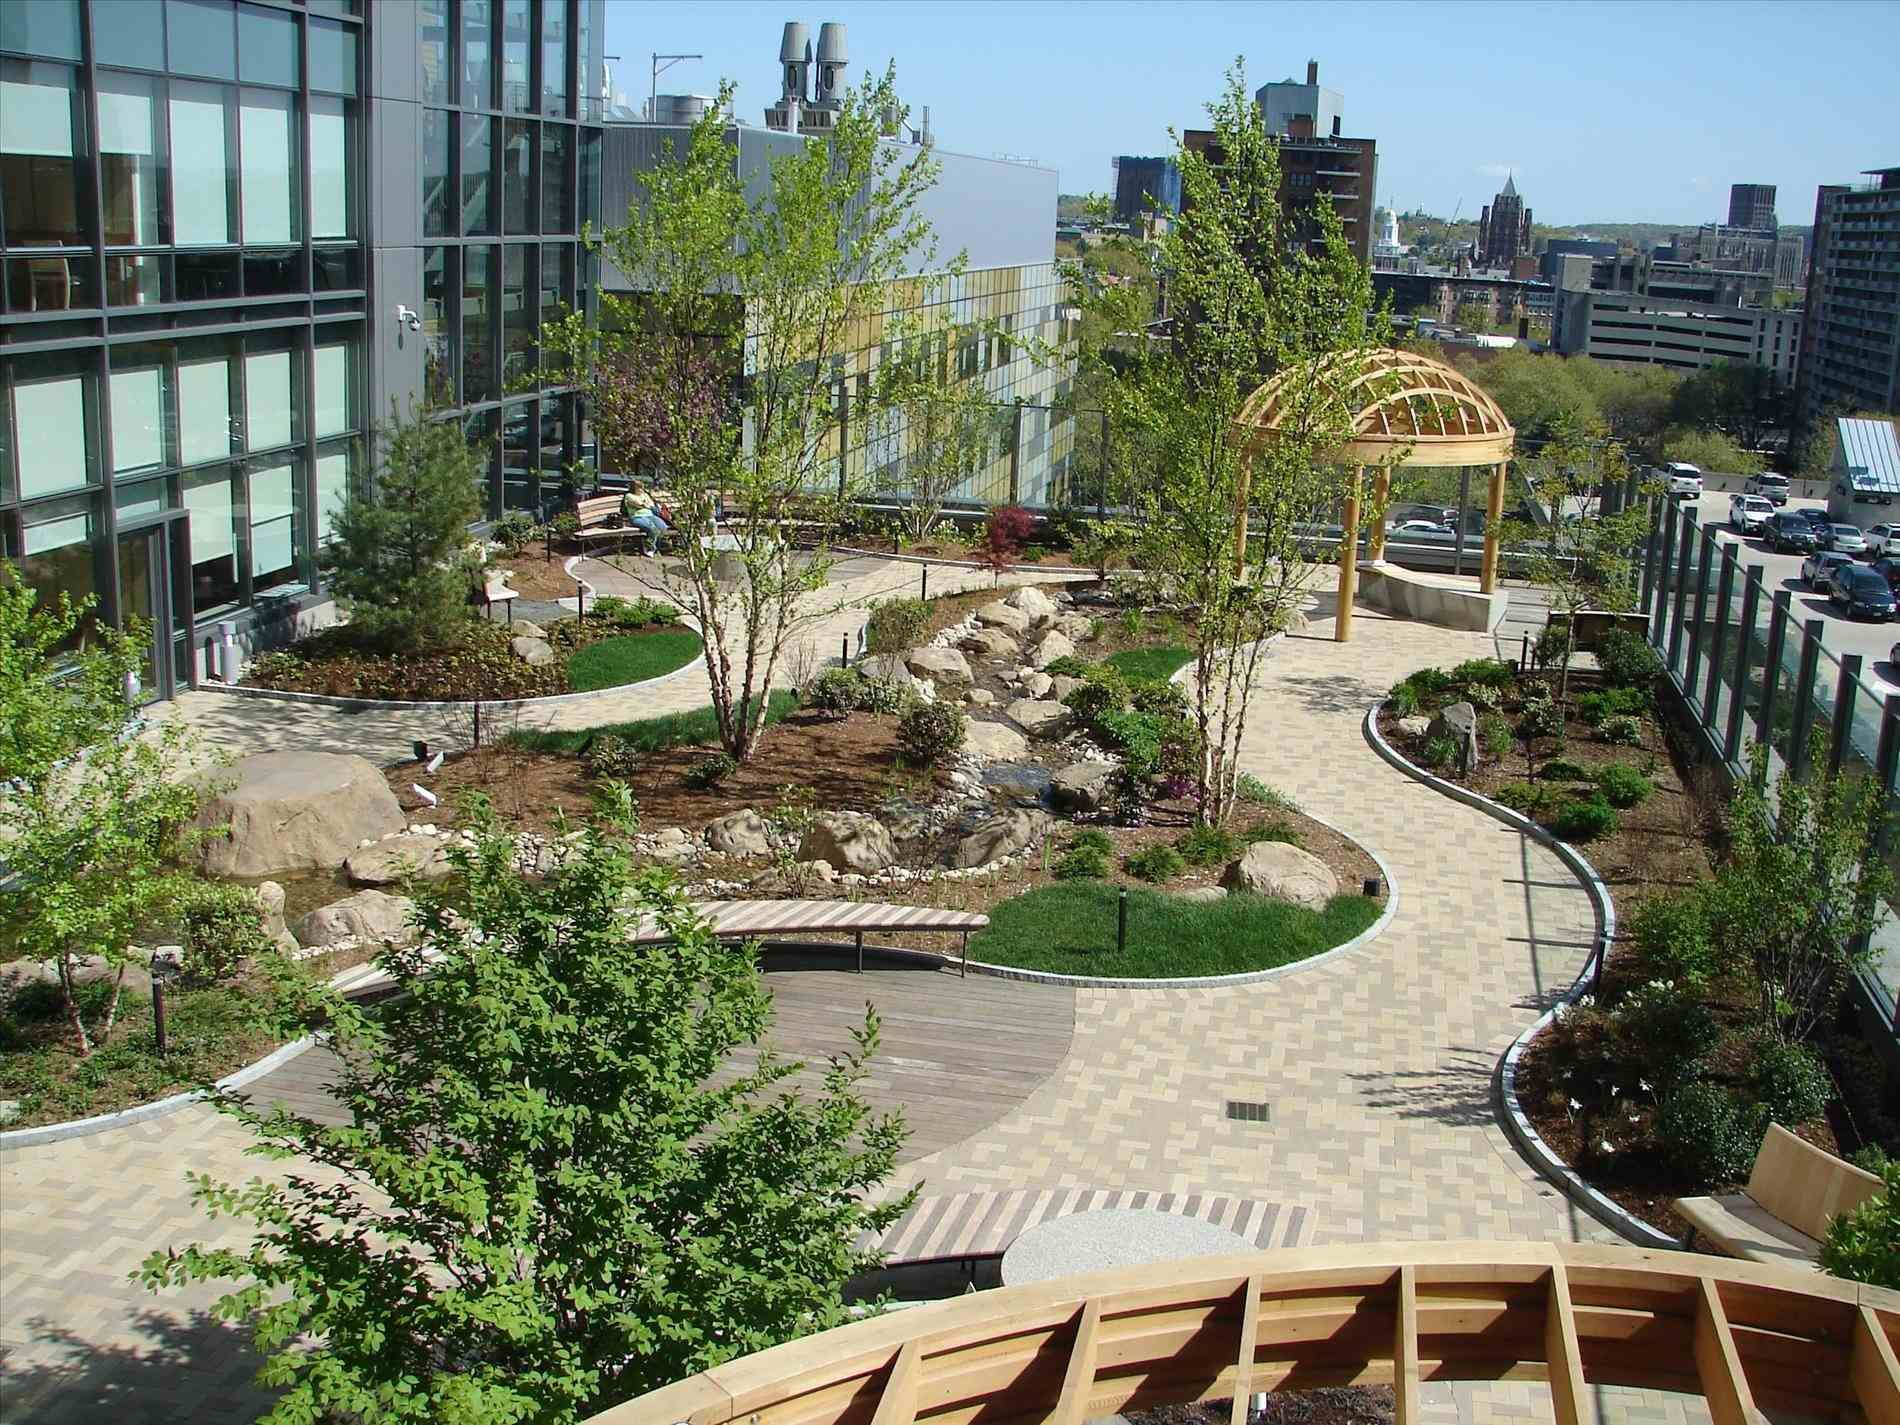 Modern Roofing Garden | Terrace garden design, Roof garden ...